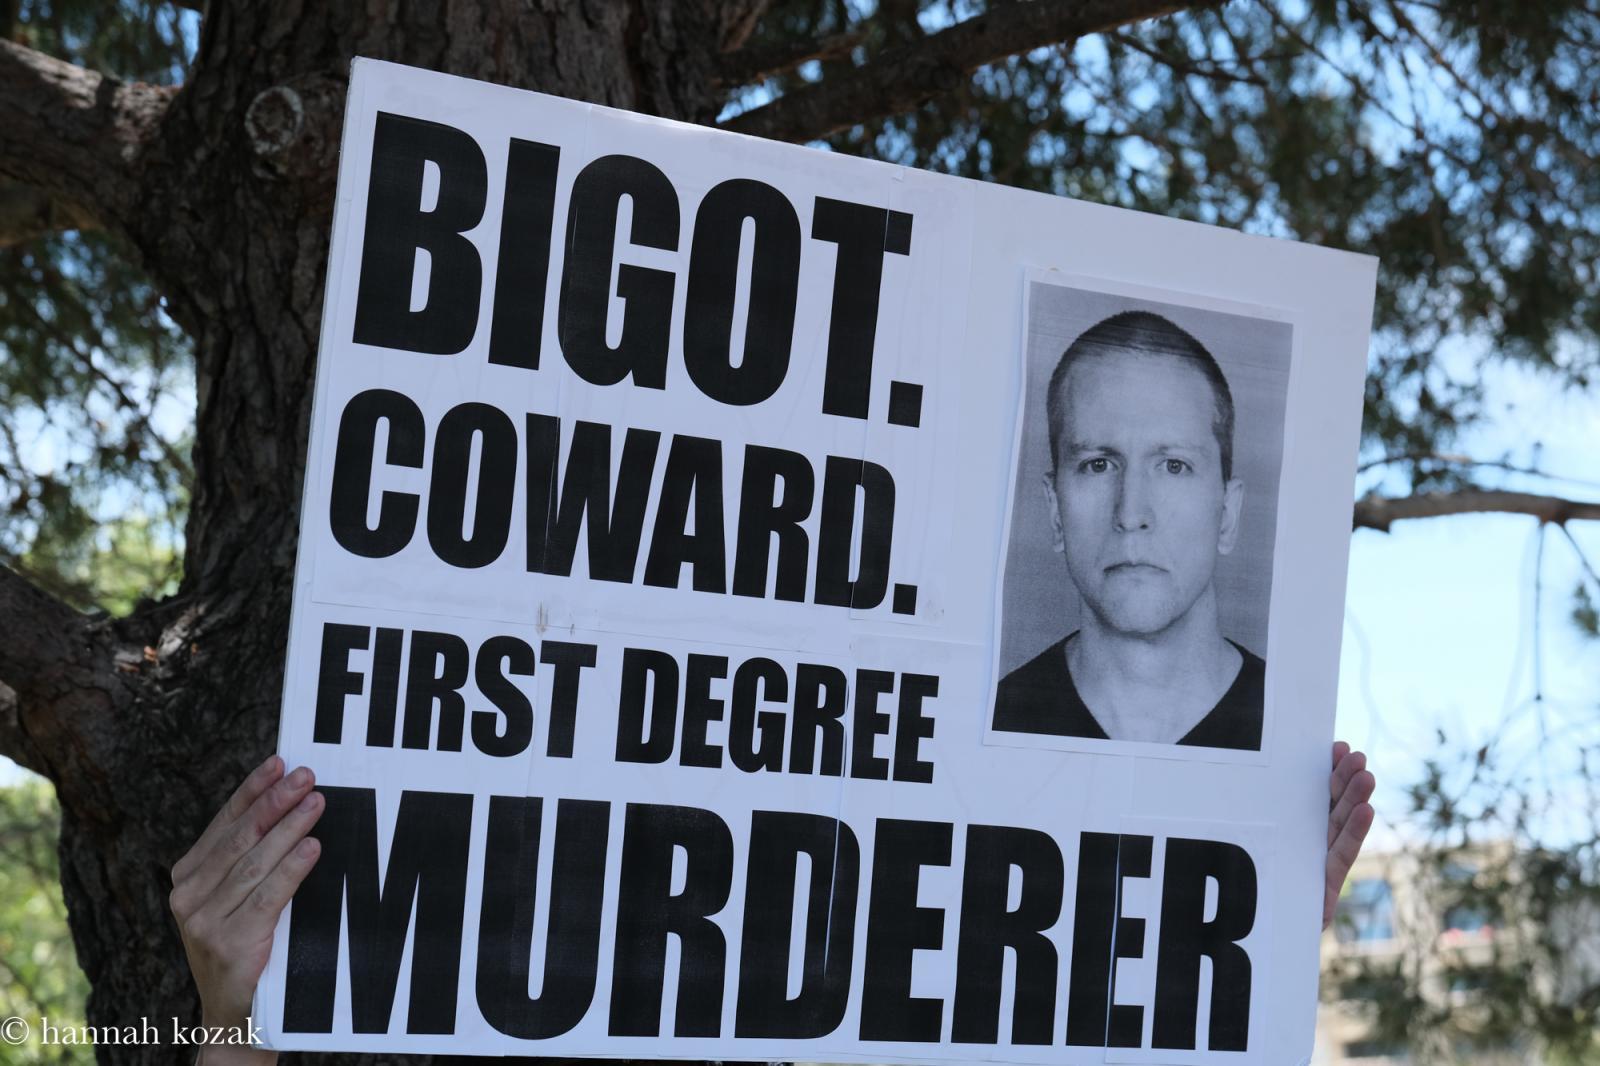 Photography image - Loading Hannah_Kozak_LA-Protest-29-May-2020_May-30_-2020_DSCF9722.jpg